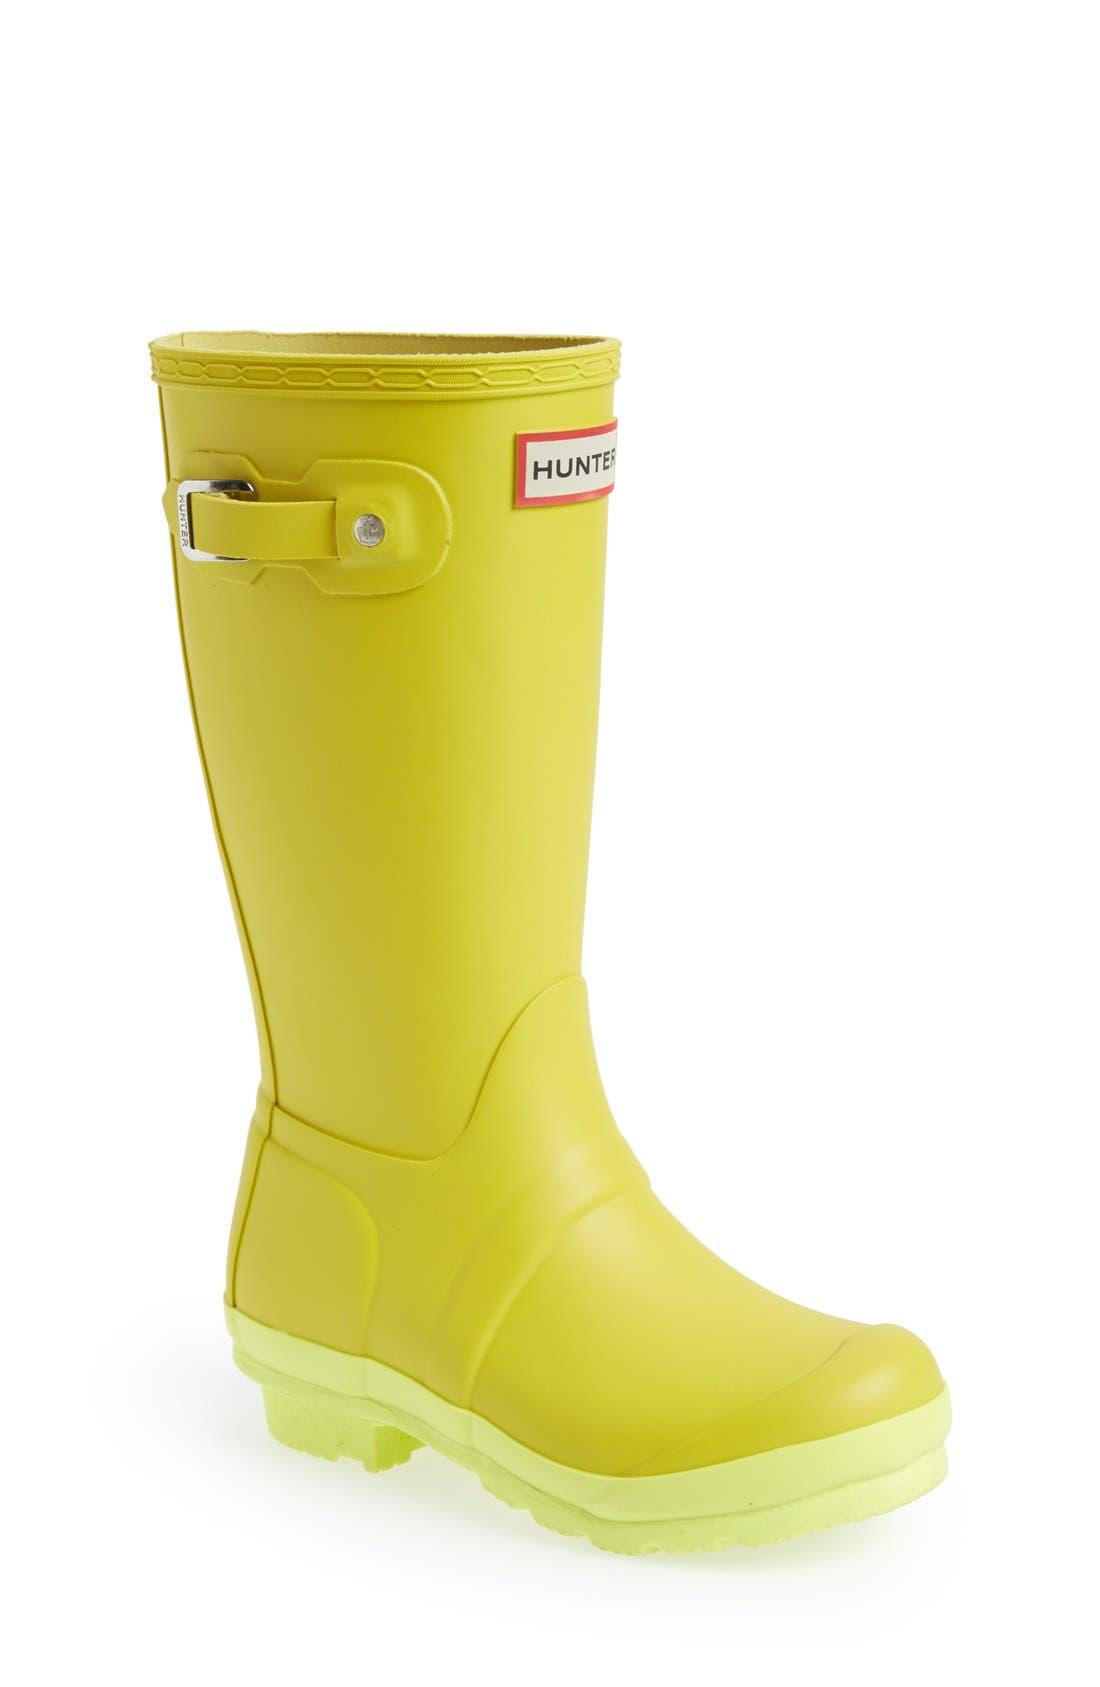 Main Image - Hunter 'Original Contrast Sole' Waterproof Rain Boot (Little Kid & Big Kid)